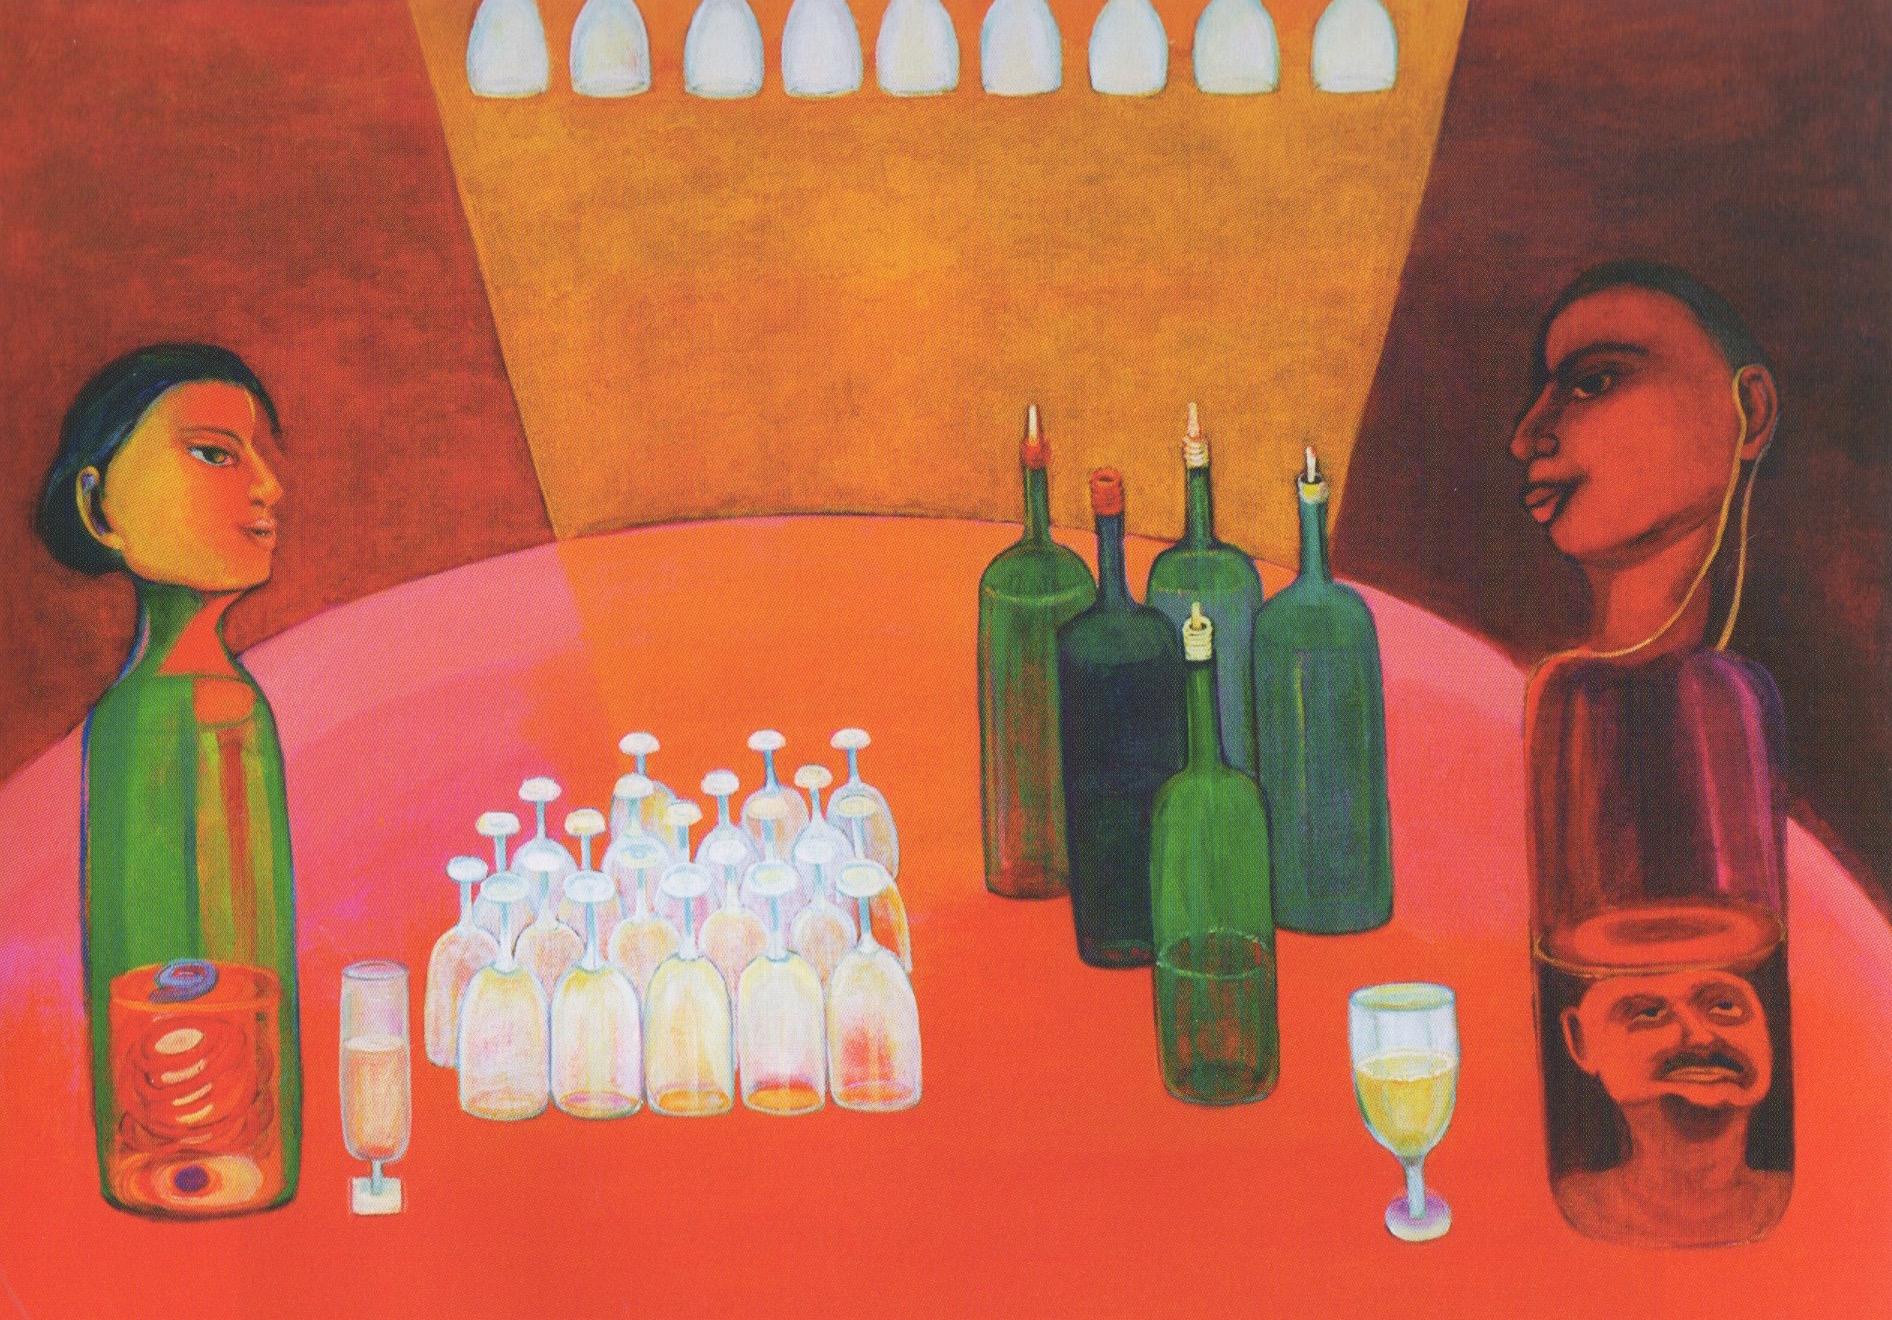 """Reincarnation into a Hallucinogenic World"" by Aradhna Tandon - Oil on Canvas"